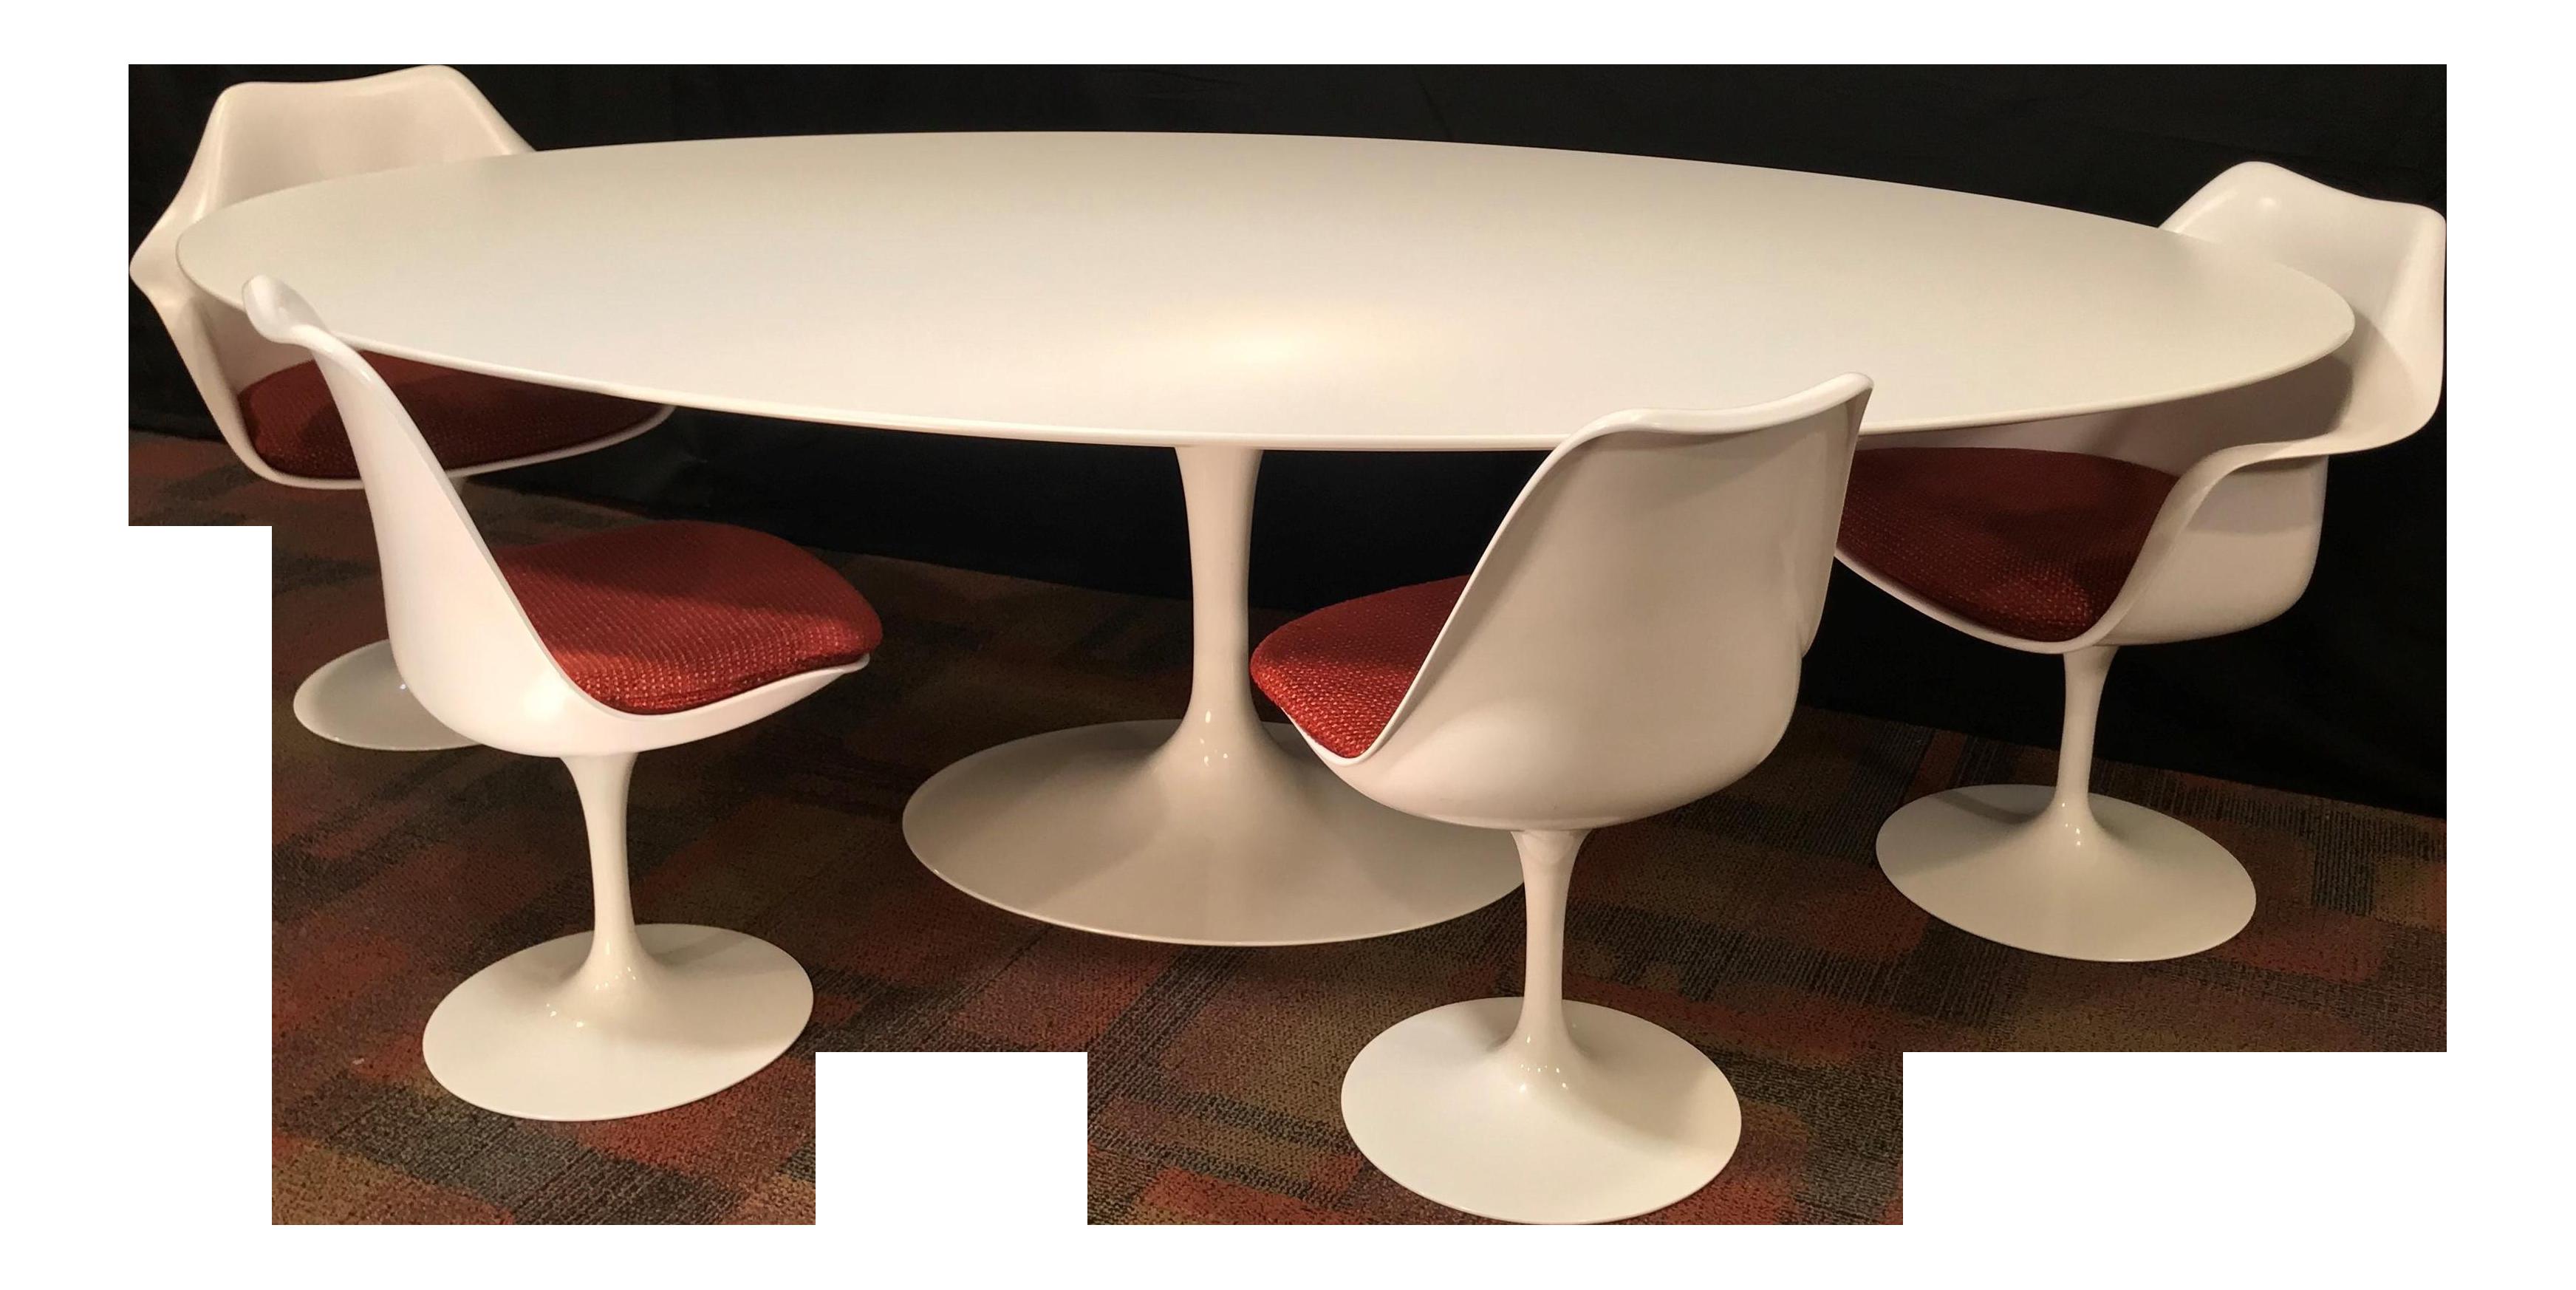 Eero Saarinen Oval Dining Table u0026 Swivel Chairs - 5 Pieces. Mid-Century Knoll | Chairish  sc 1 st  Chairish & Eero Saarinen Oval Dining Table u0026 Swivel Chairs - 5 Pieces. Mid ...